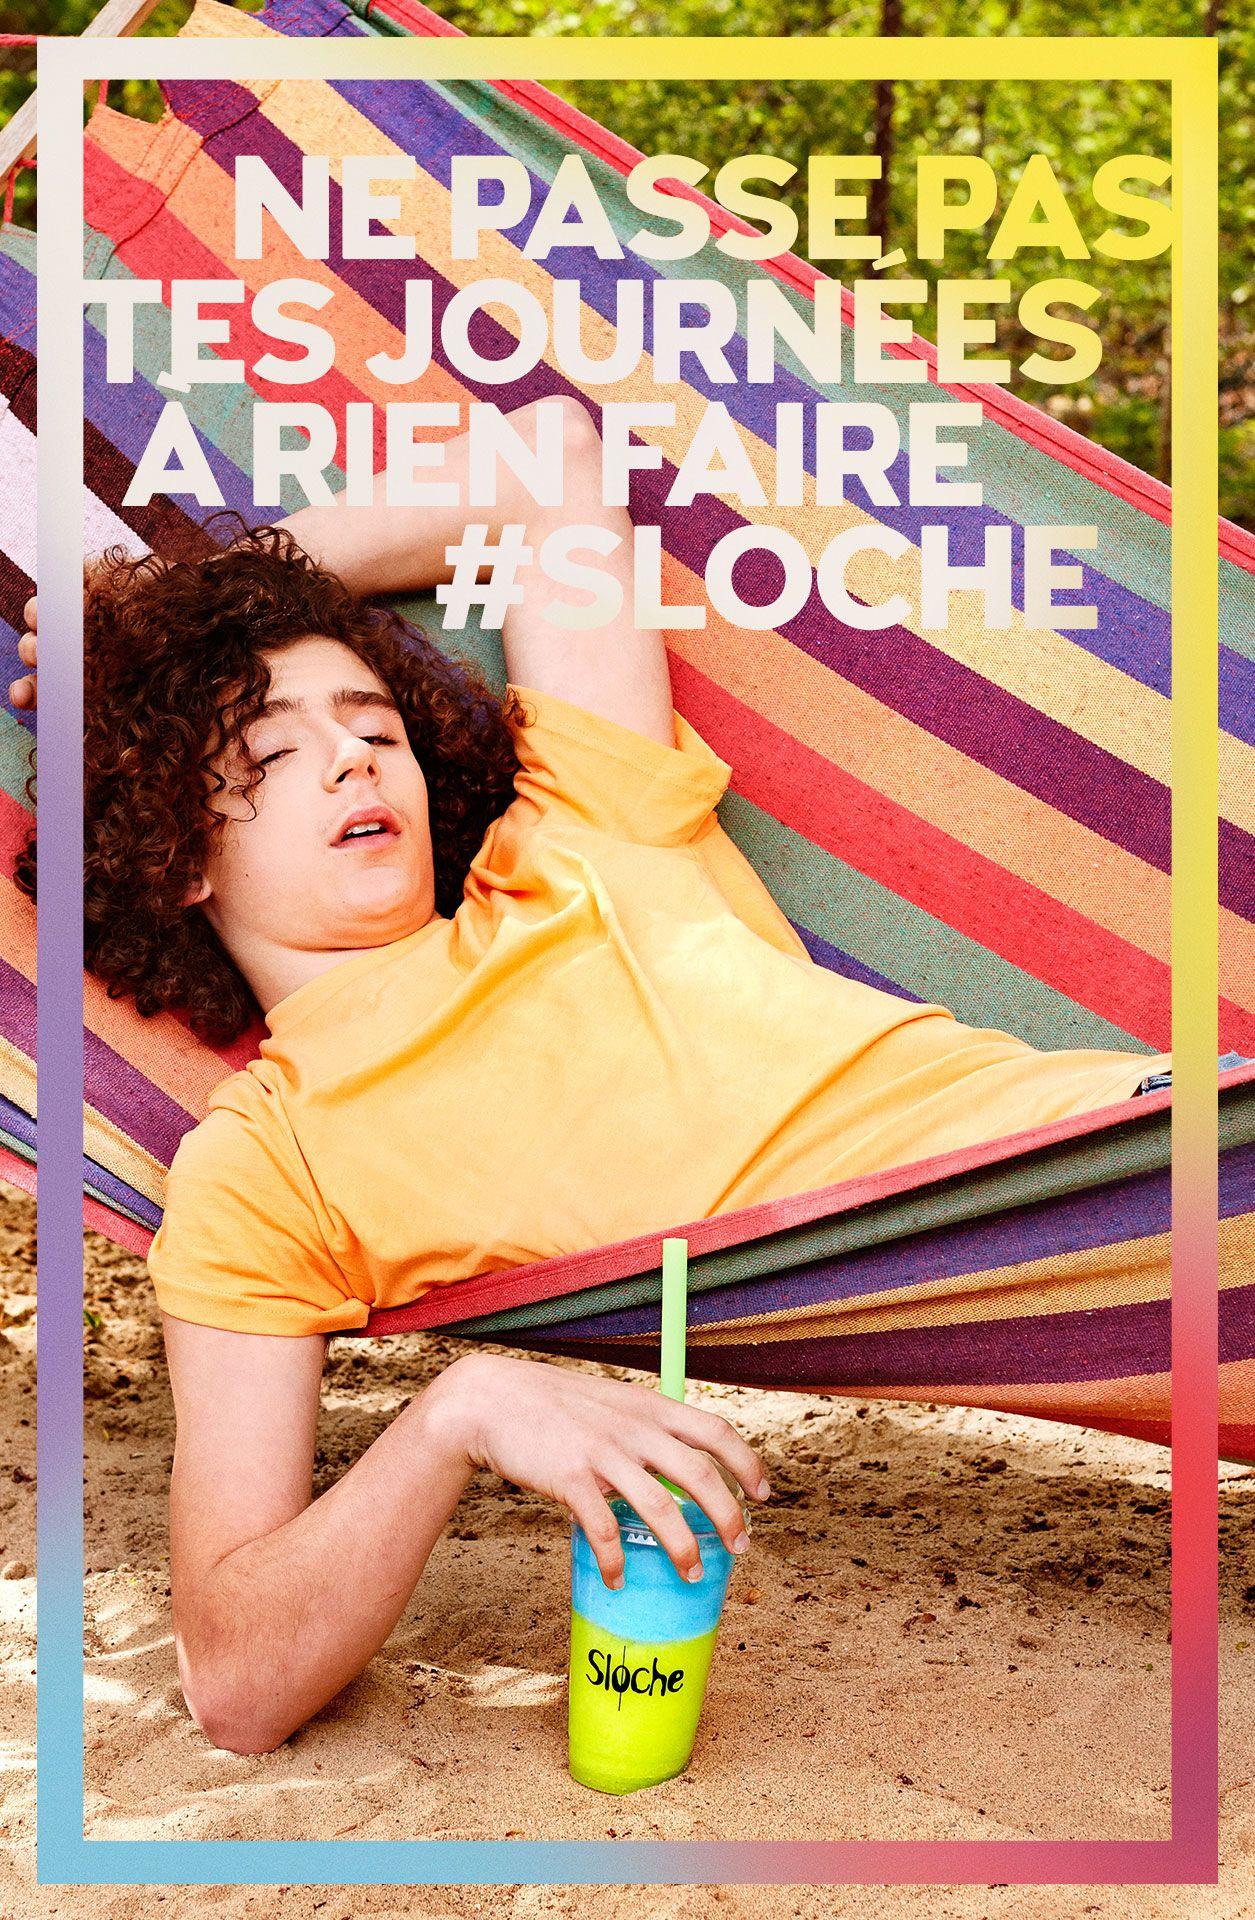 teenage boy in a hamoc half-asleep hand on blue and green slurpee by Jocelyn Michel for Sloche Couche Tard with Havas